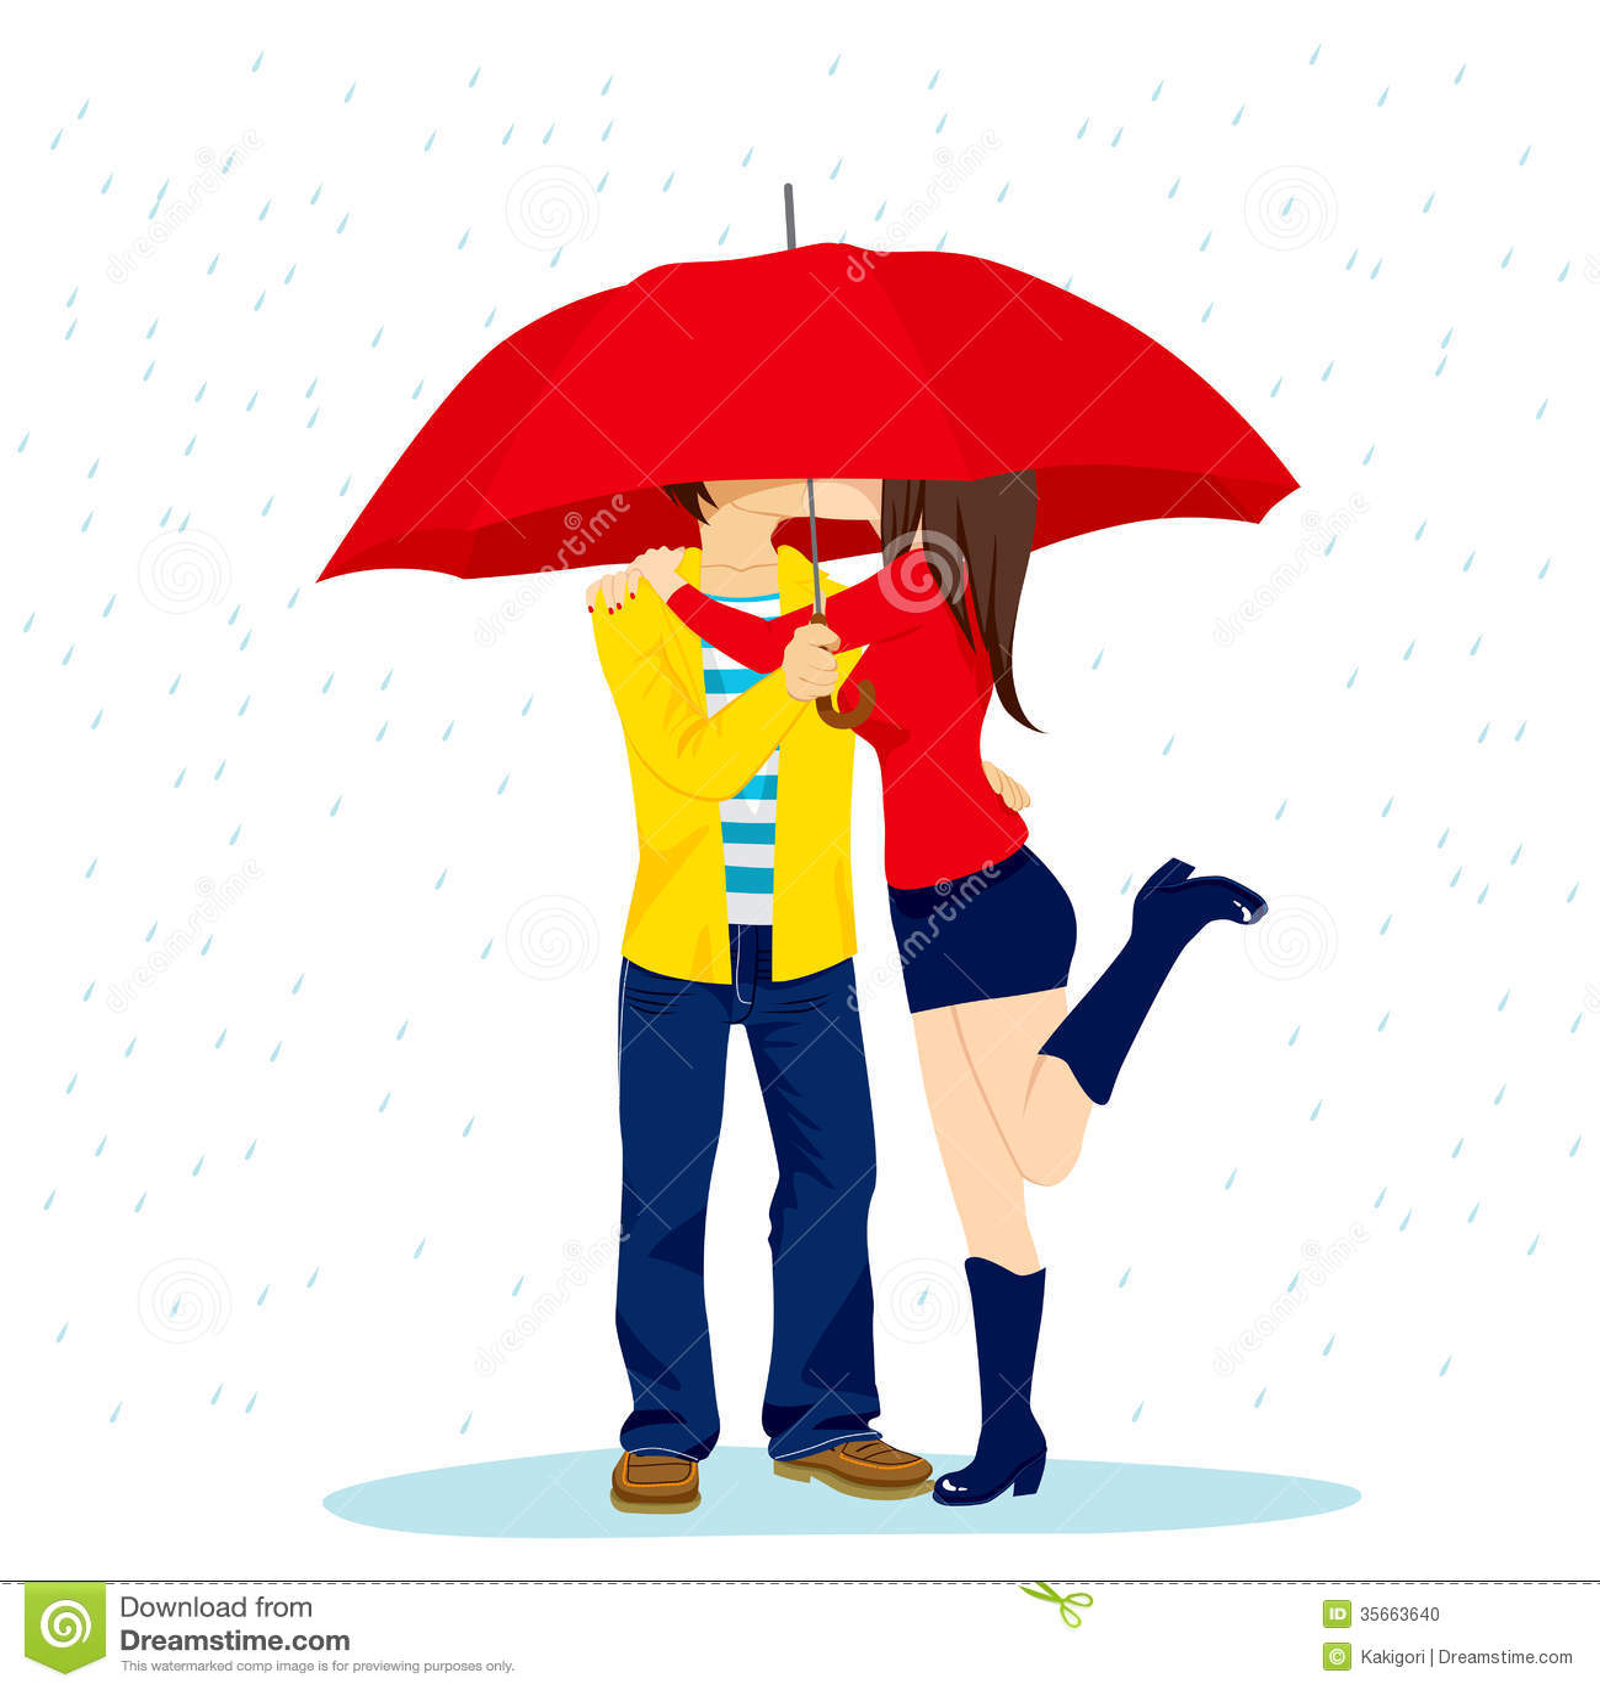 Clipart Rainy Day Umbrella